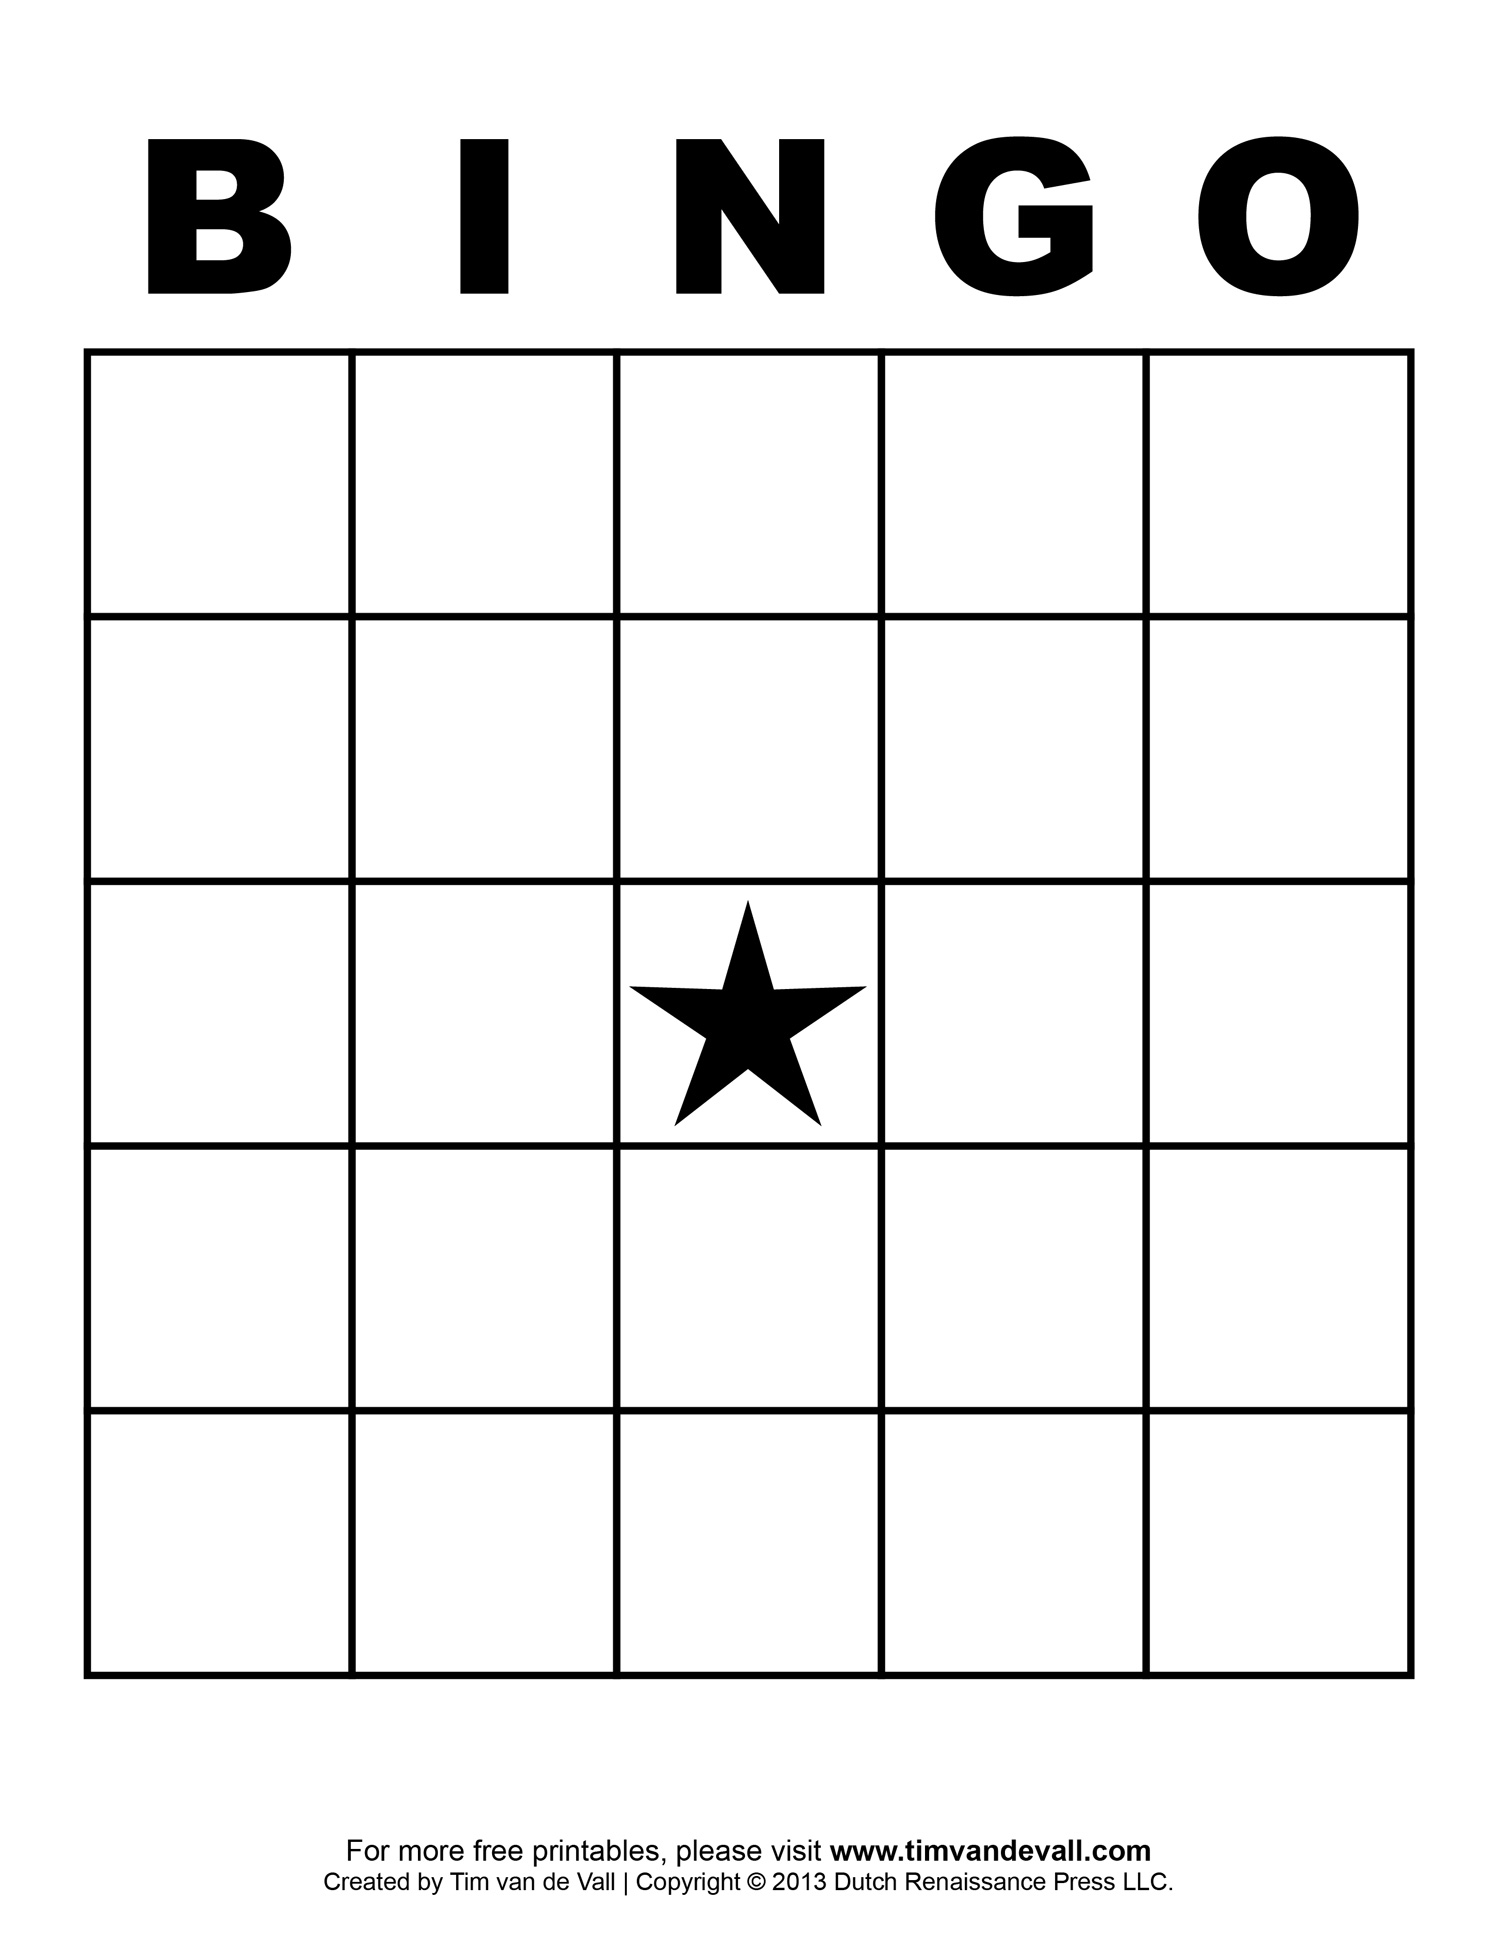 5x5 Bingo